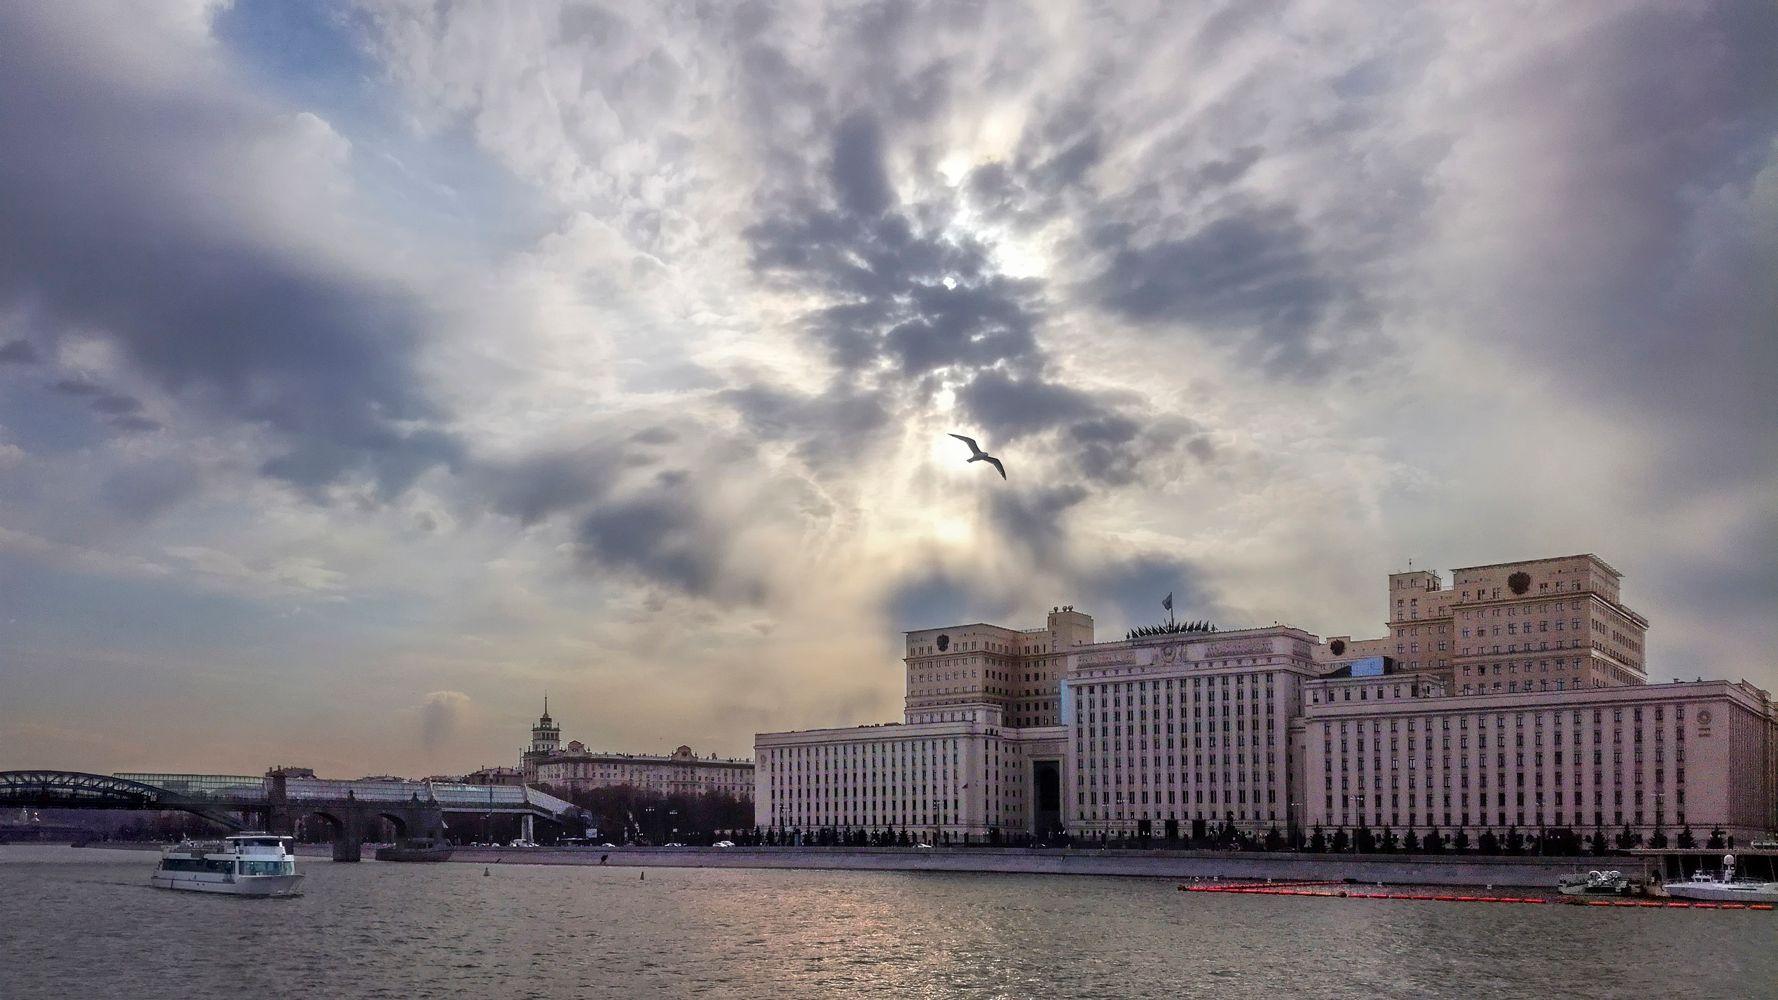 Министерство обороны РФ Москва министерство обороны река_Москва Андреевский мост